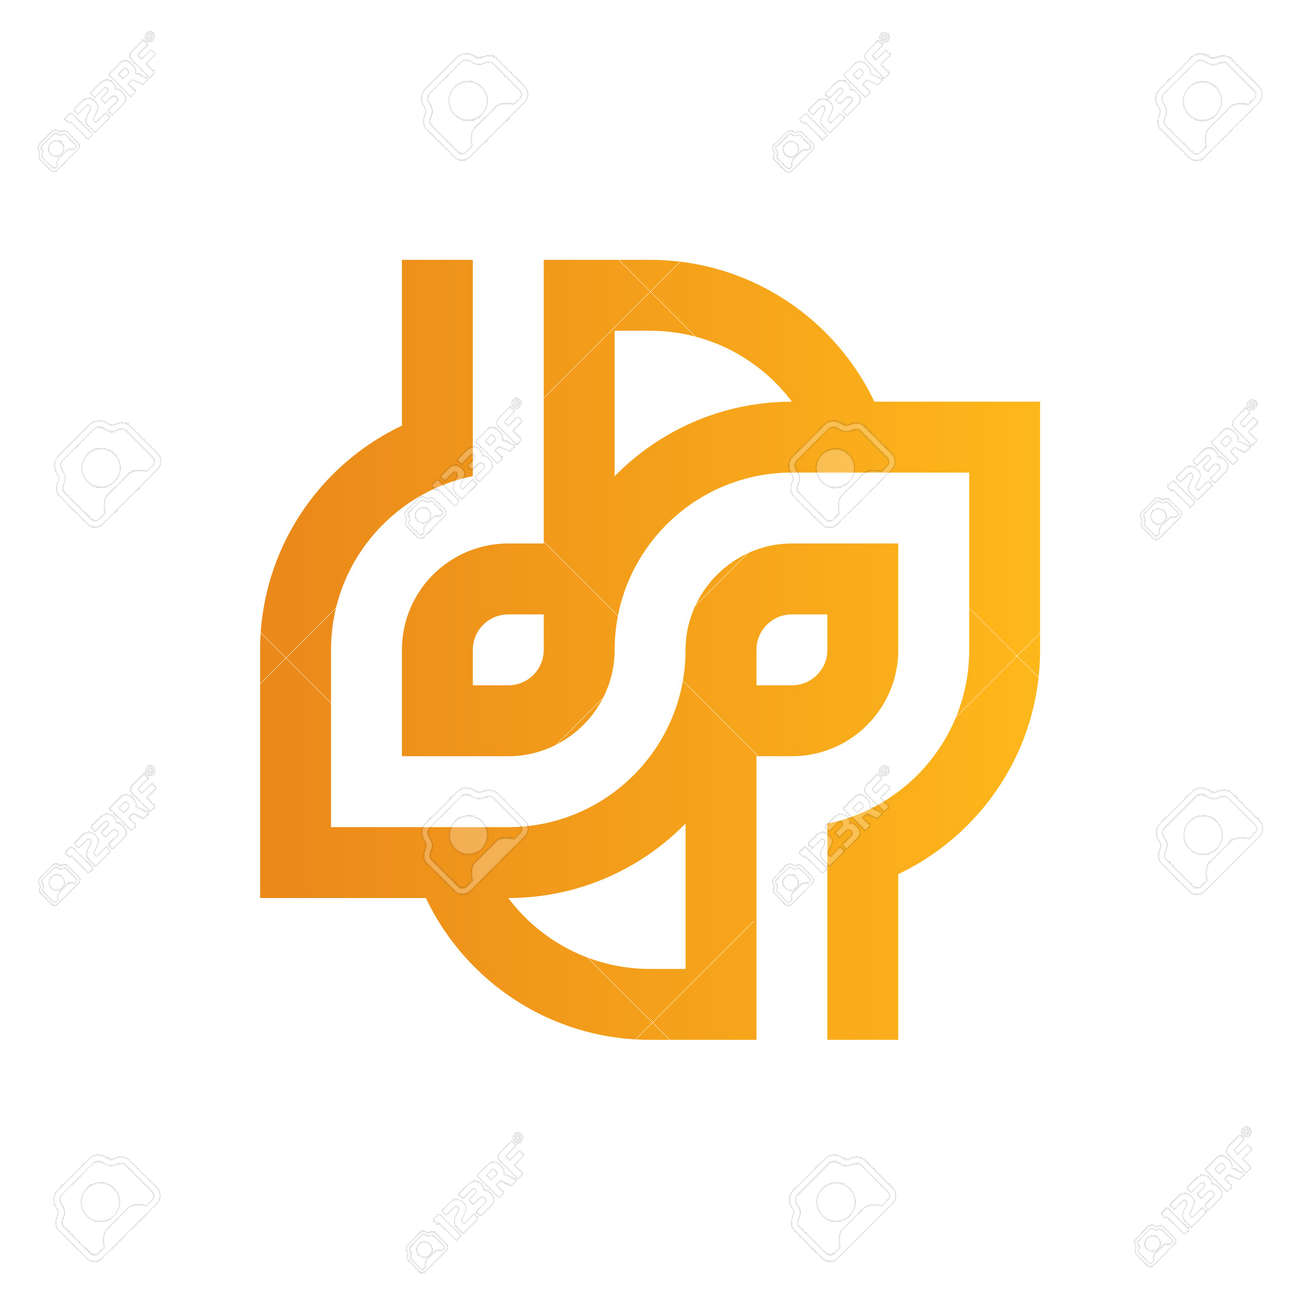 Logo design company name letter s infinity connecting symbol logo design company name letter s infinity connecting symbol icon abstract vector stock vector 45283477 buycottarizona